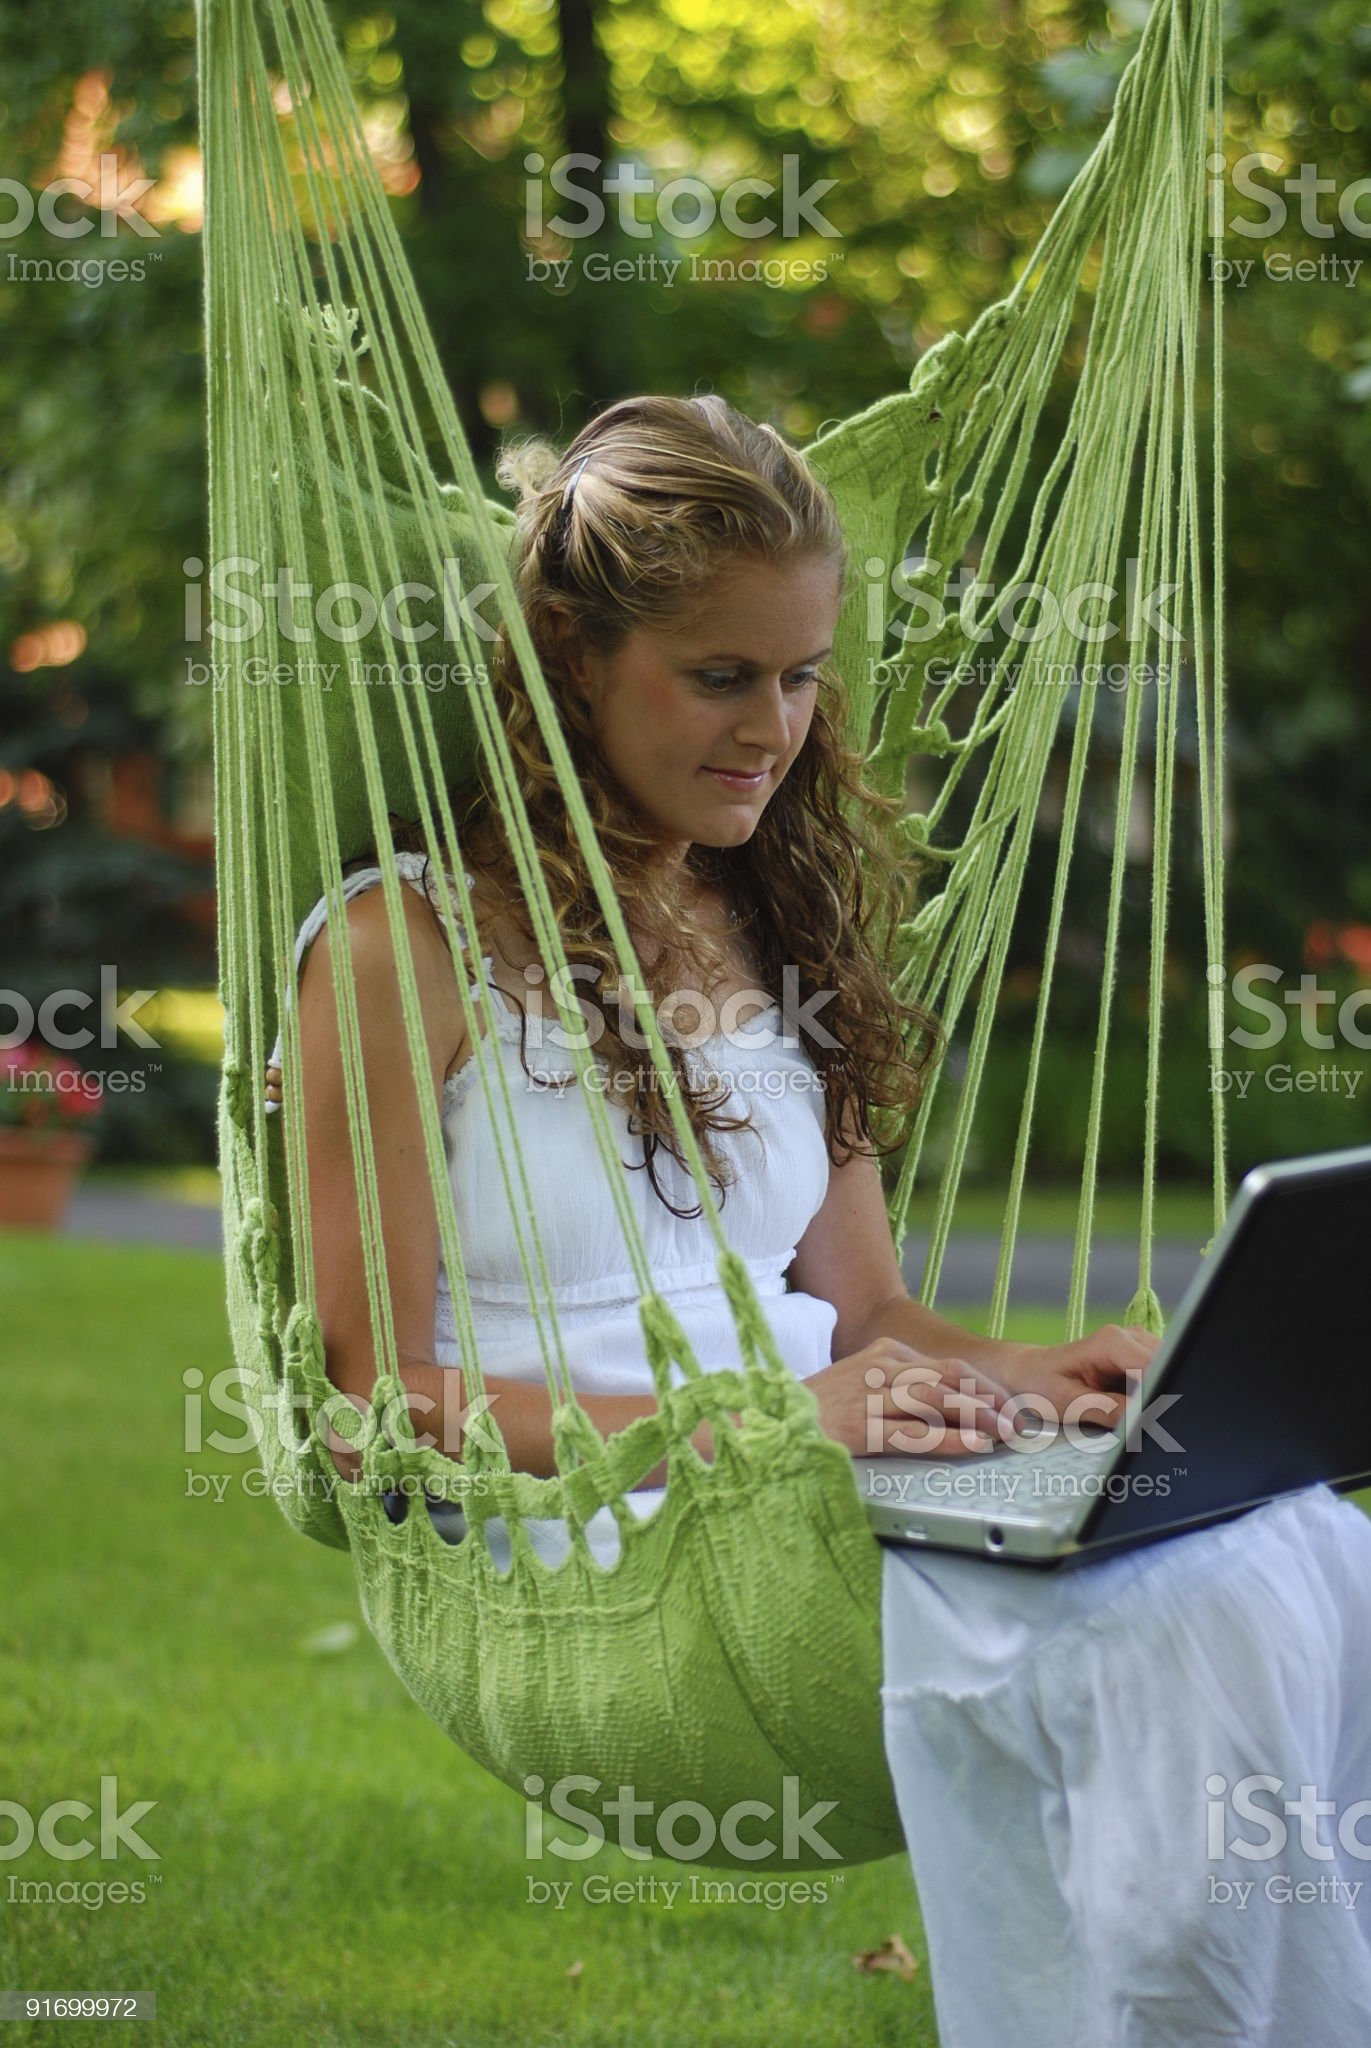 Green Hammock Laptop royalty-free stock photo